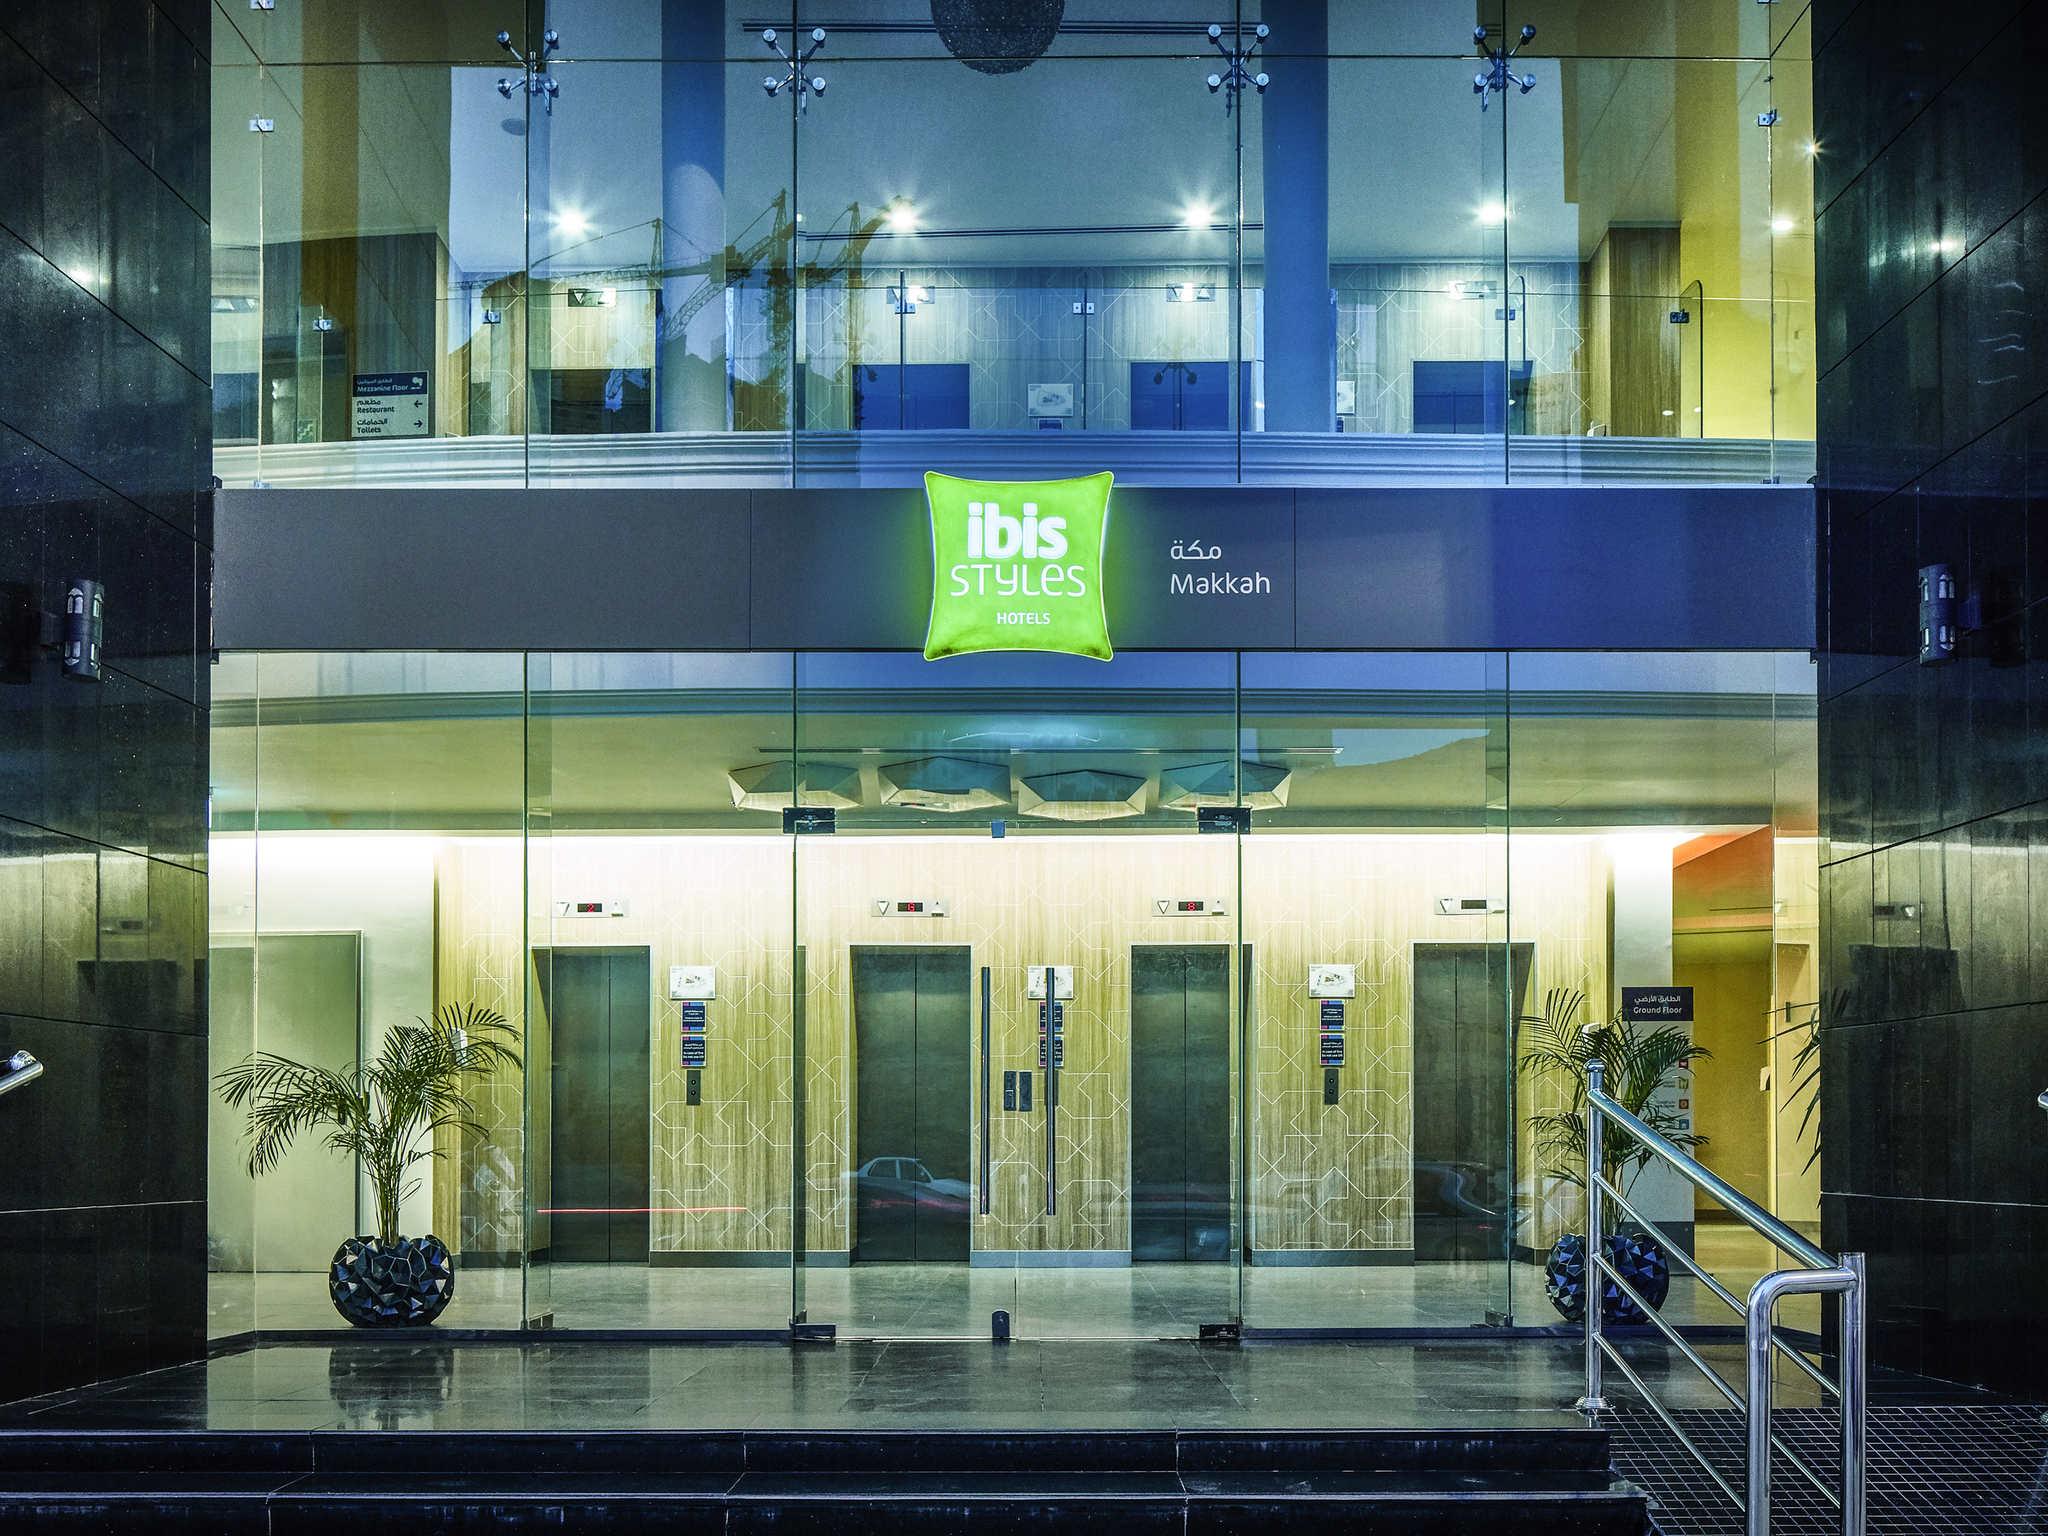 Hotell – ibis Styles Makkah